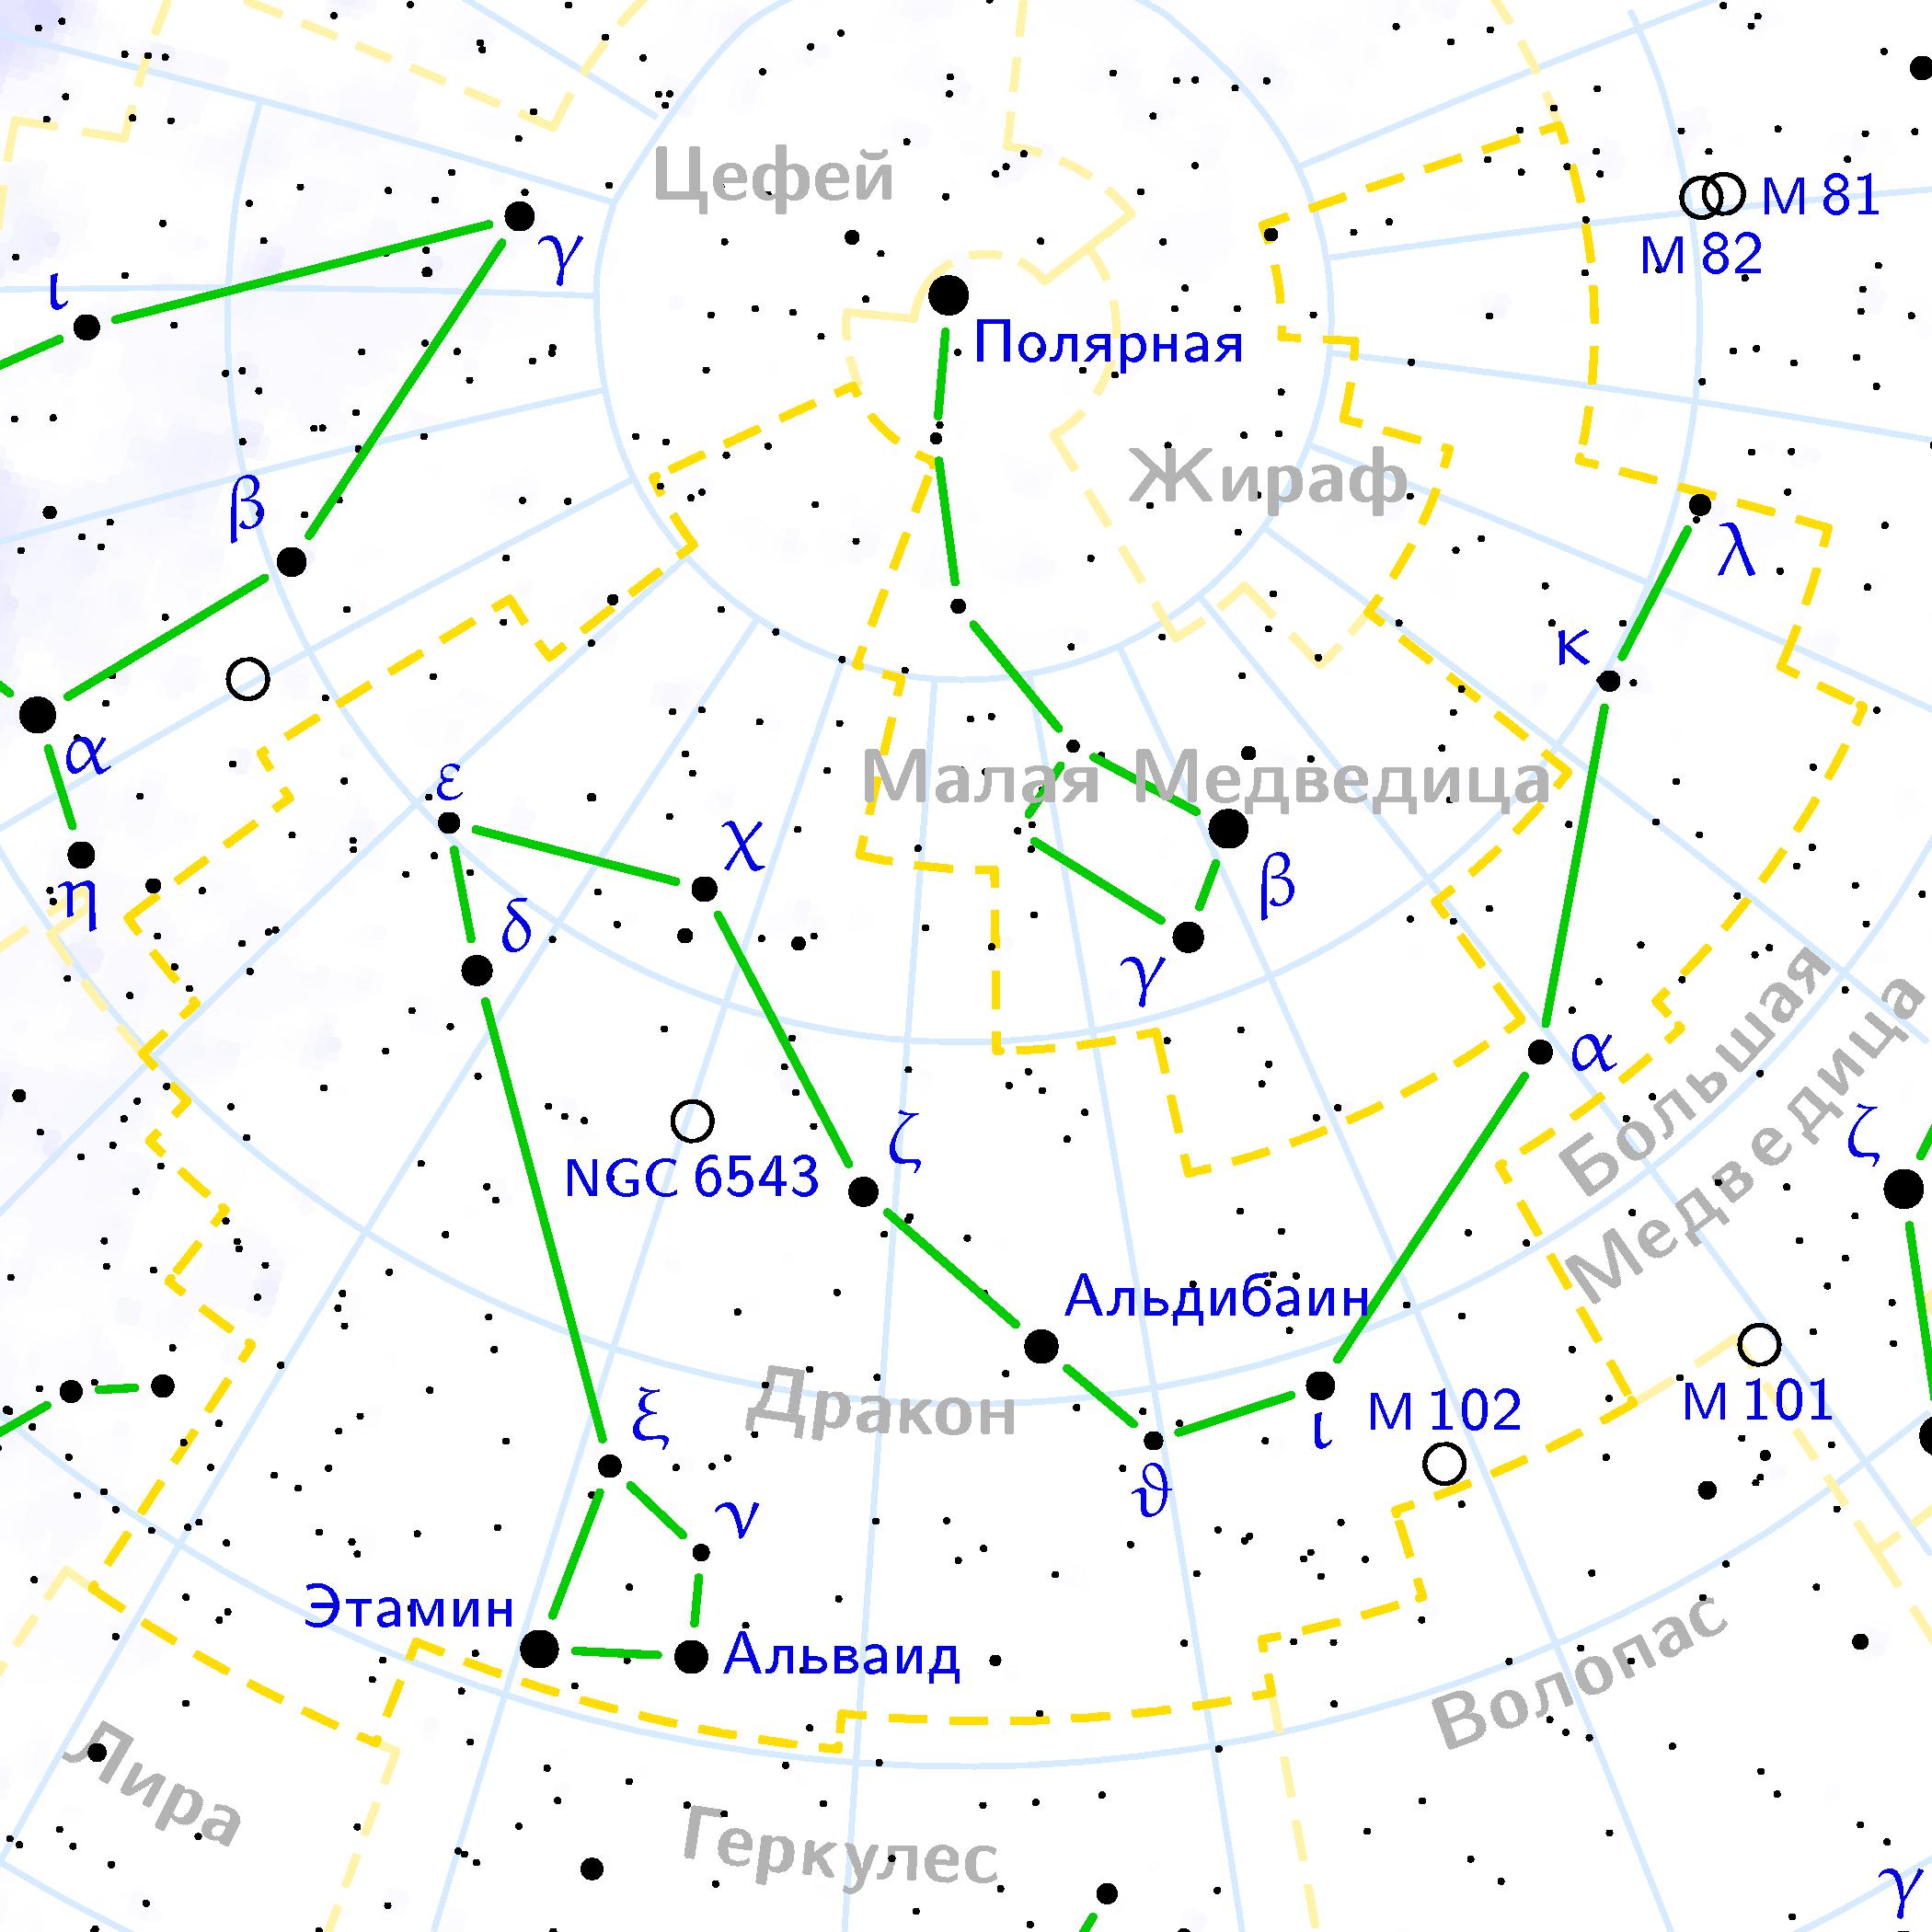 Звёздная Карта Неба - energocontinent: http://energocontinent.weebly.com/blog/zvyozdnaya-karta-neba